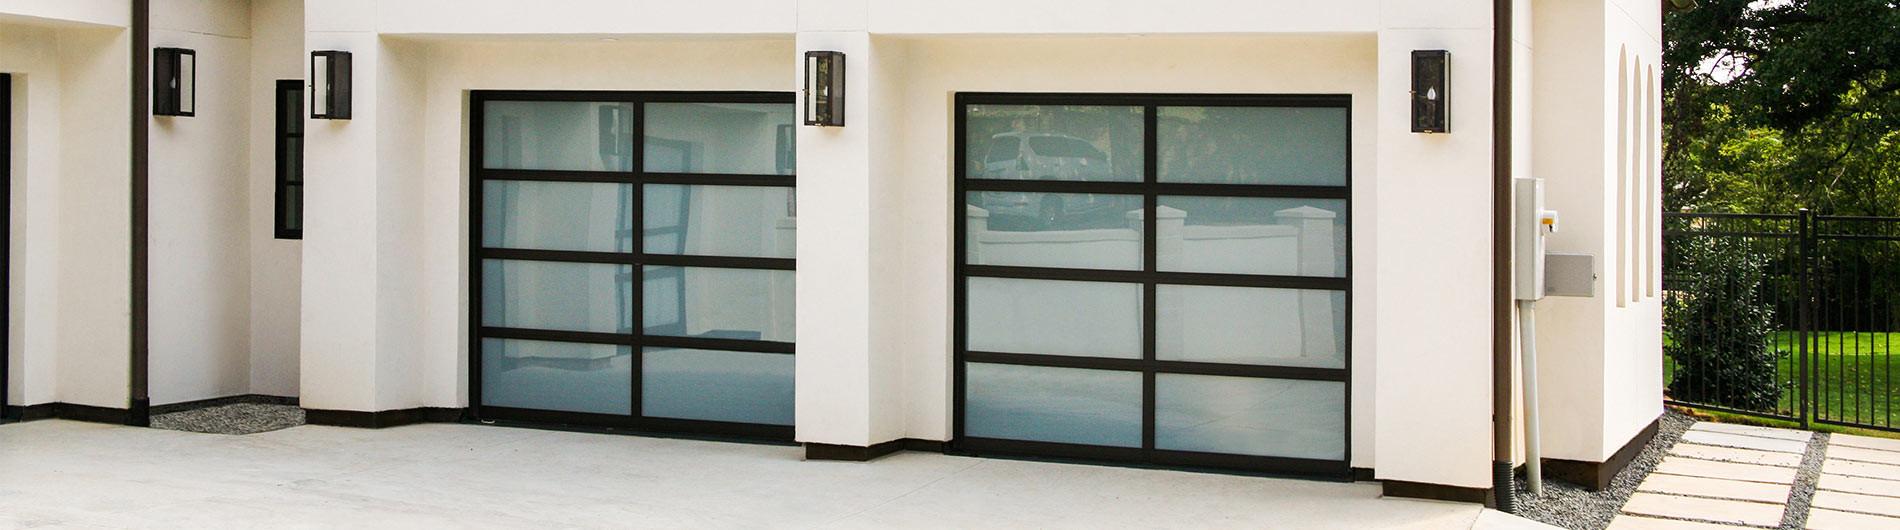 8850-Aluminum-PowderCoat-Black-WhiteLami